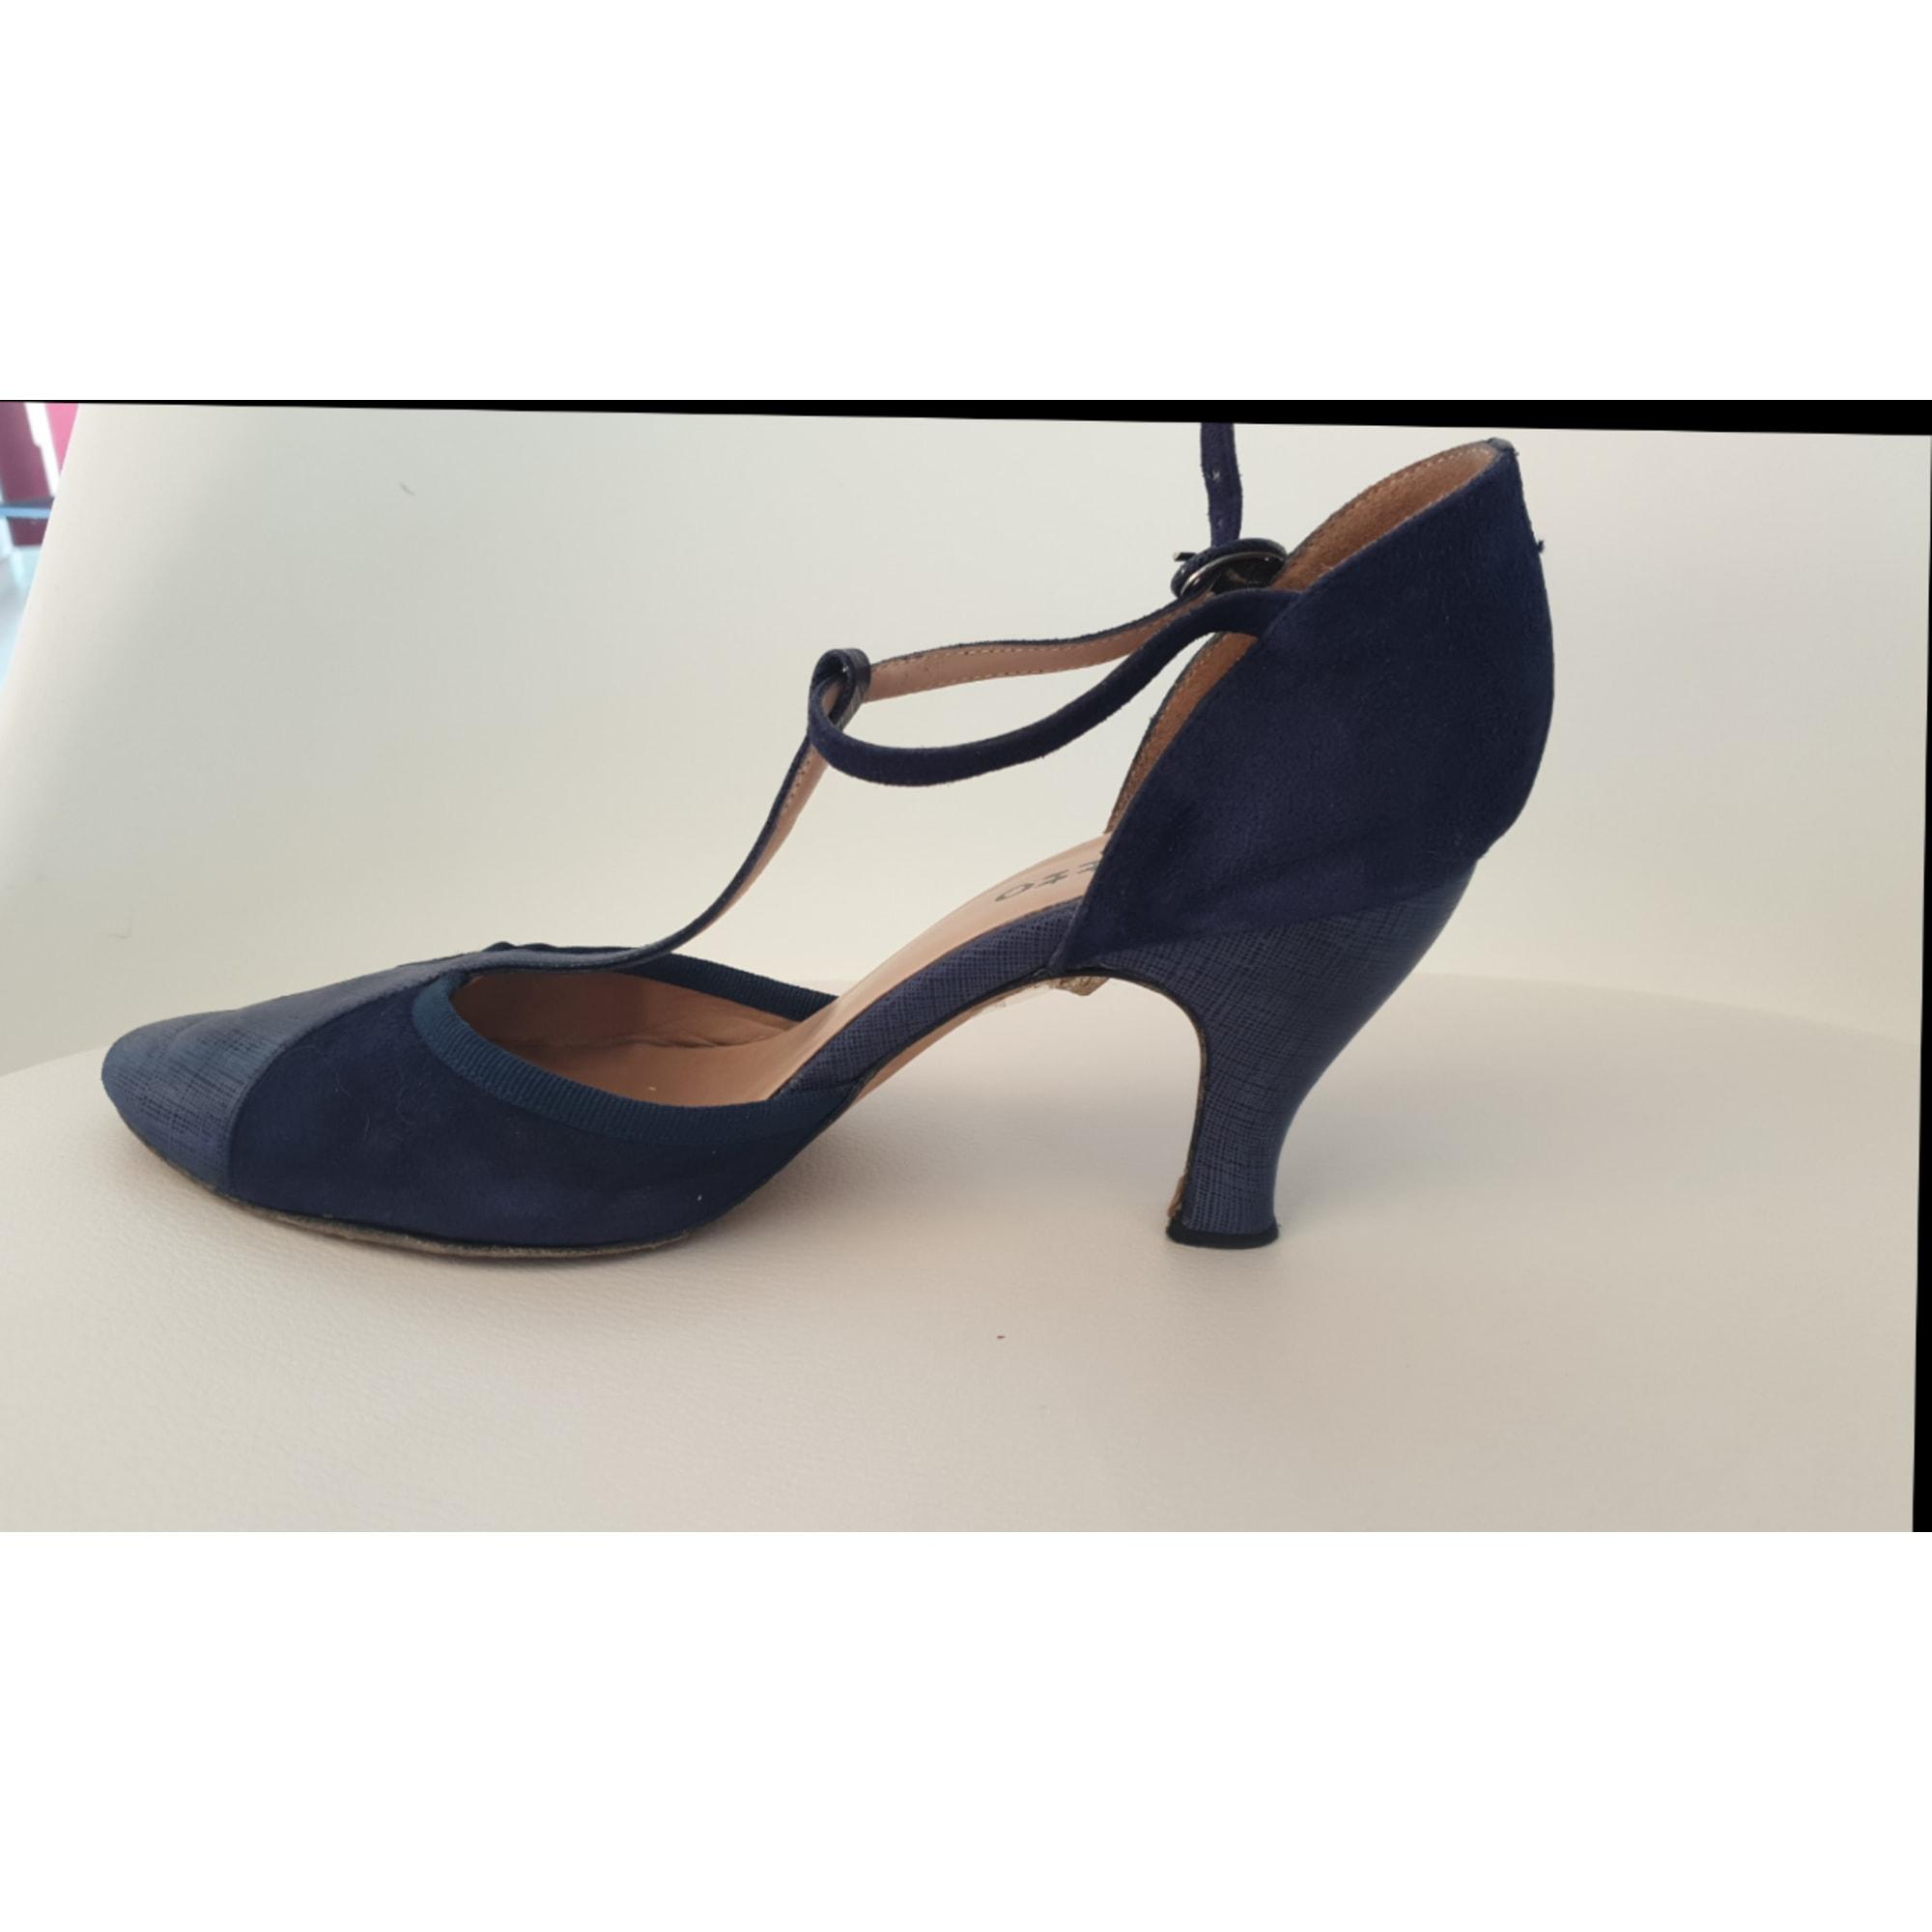 Chaussures de danse  REPETTO Bleu, bleu marine, bleu turquoise